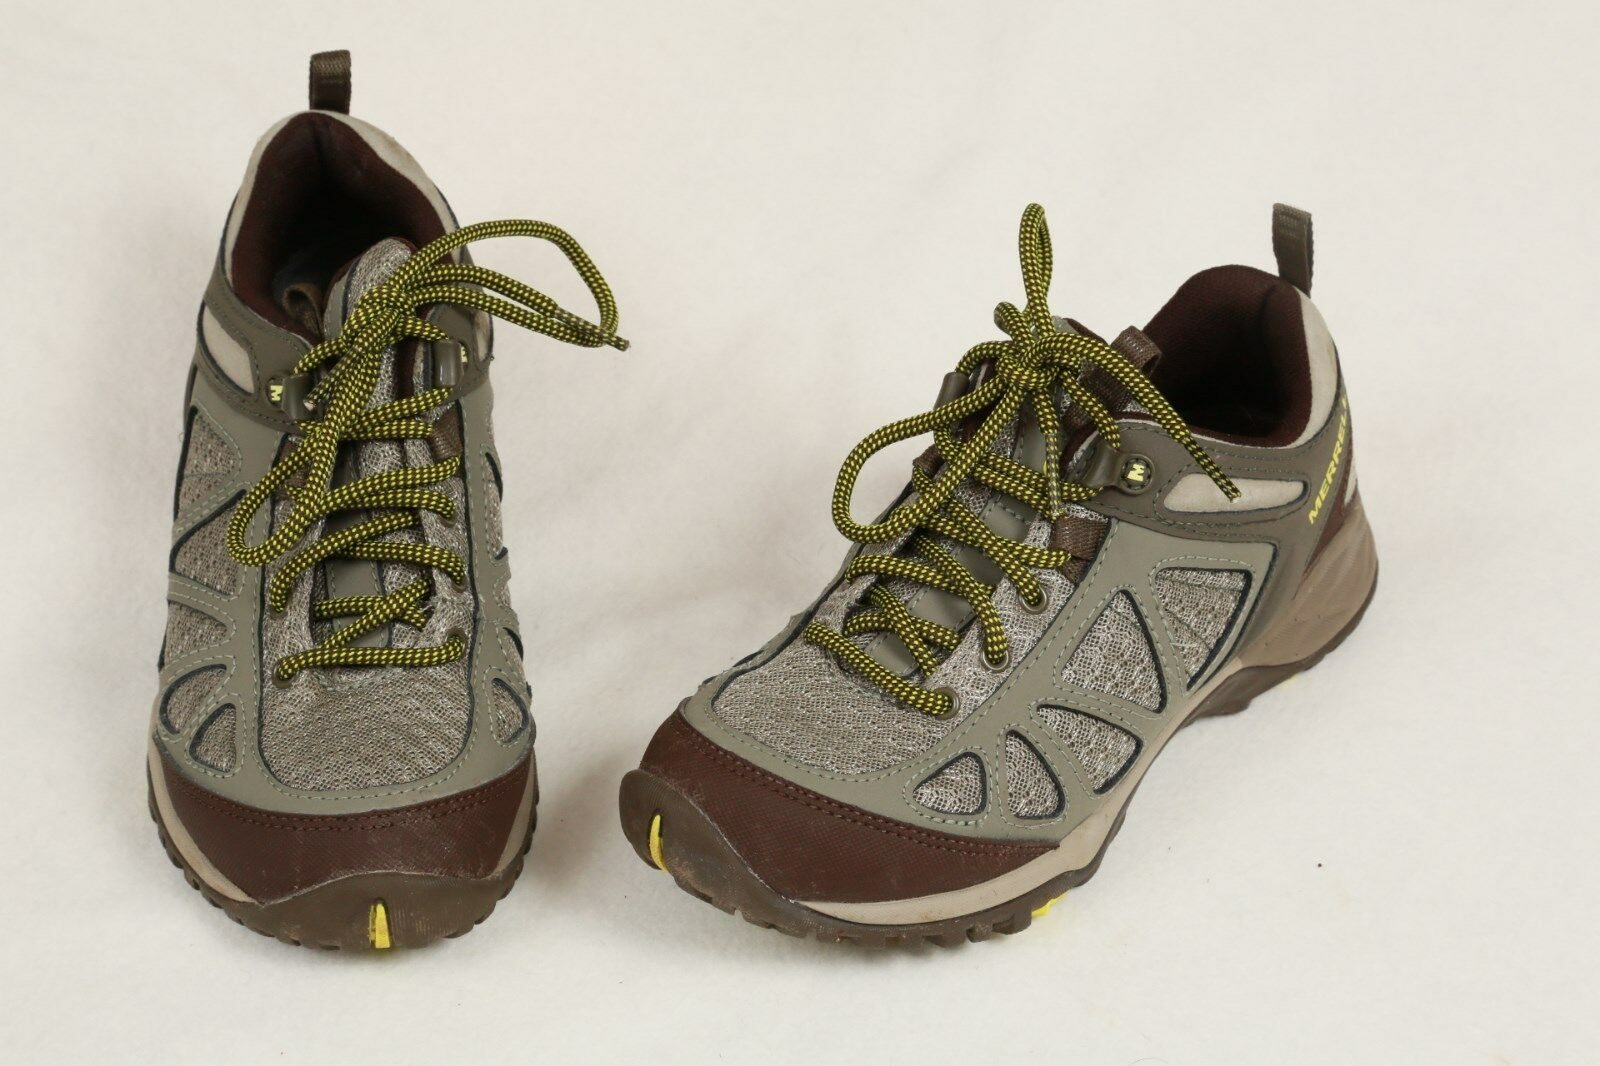 Merrell J37464 Women's Siren Sport Dusty Olive Q2 Hiking Mesh Sneaker shoes 5.5